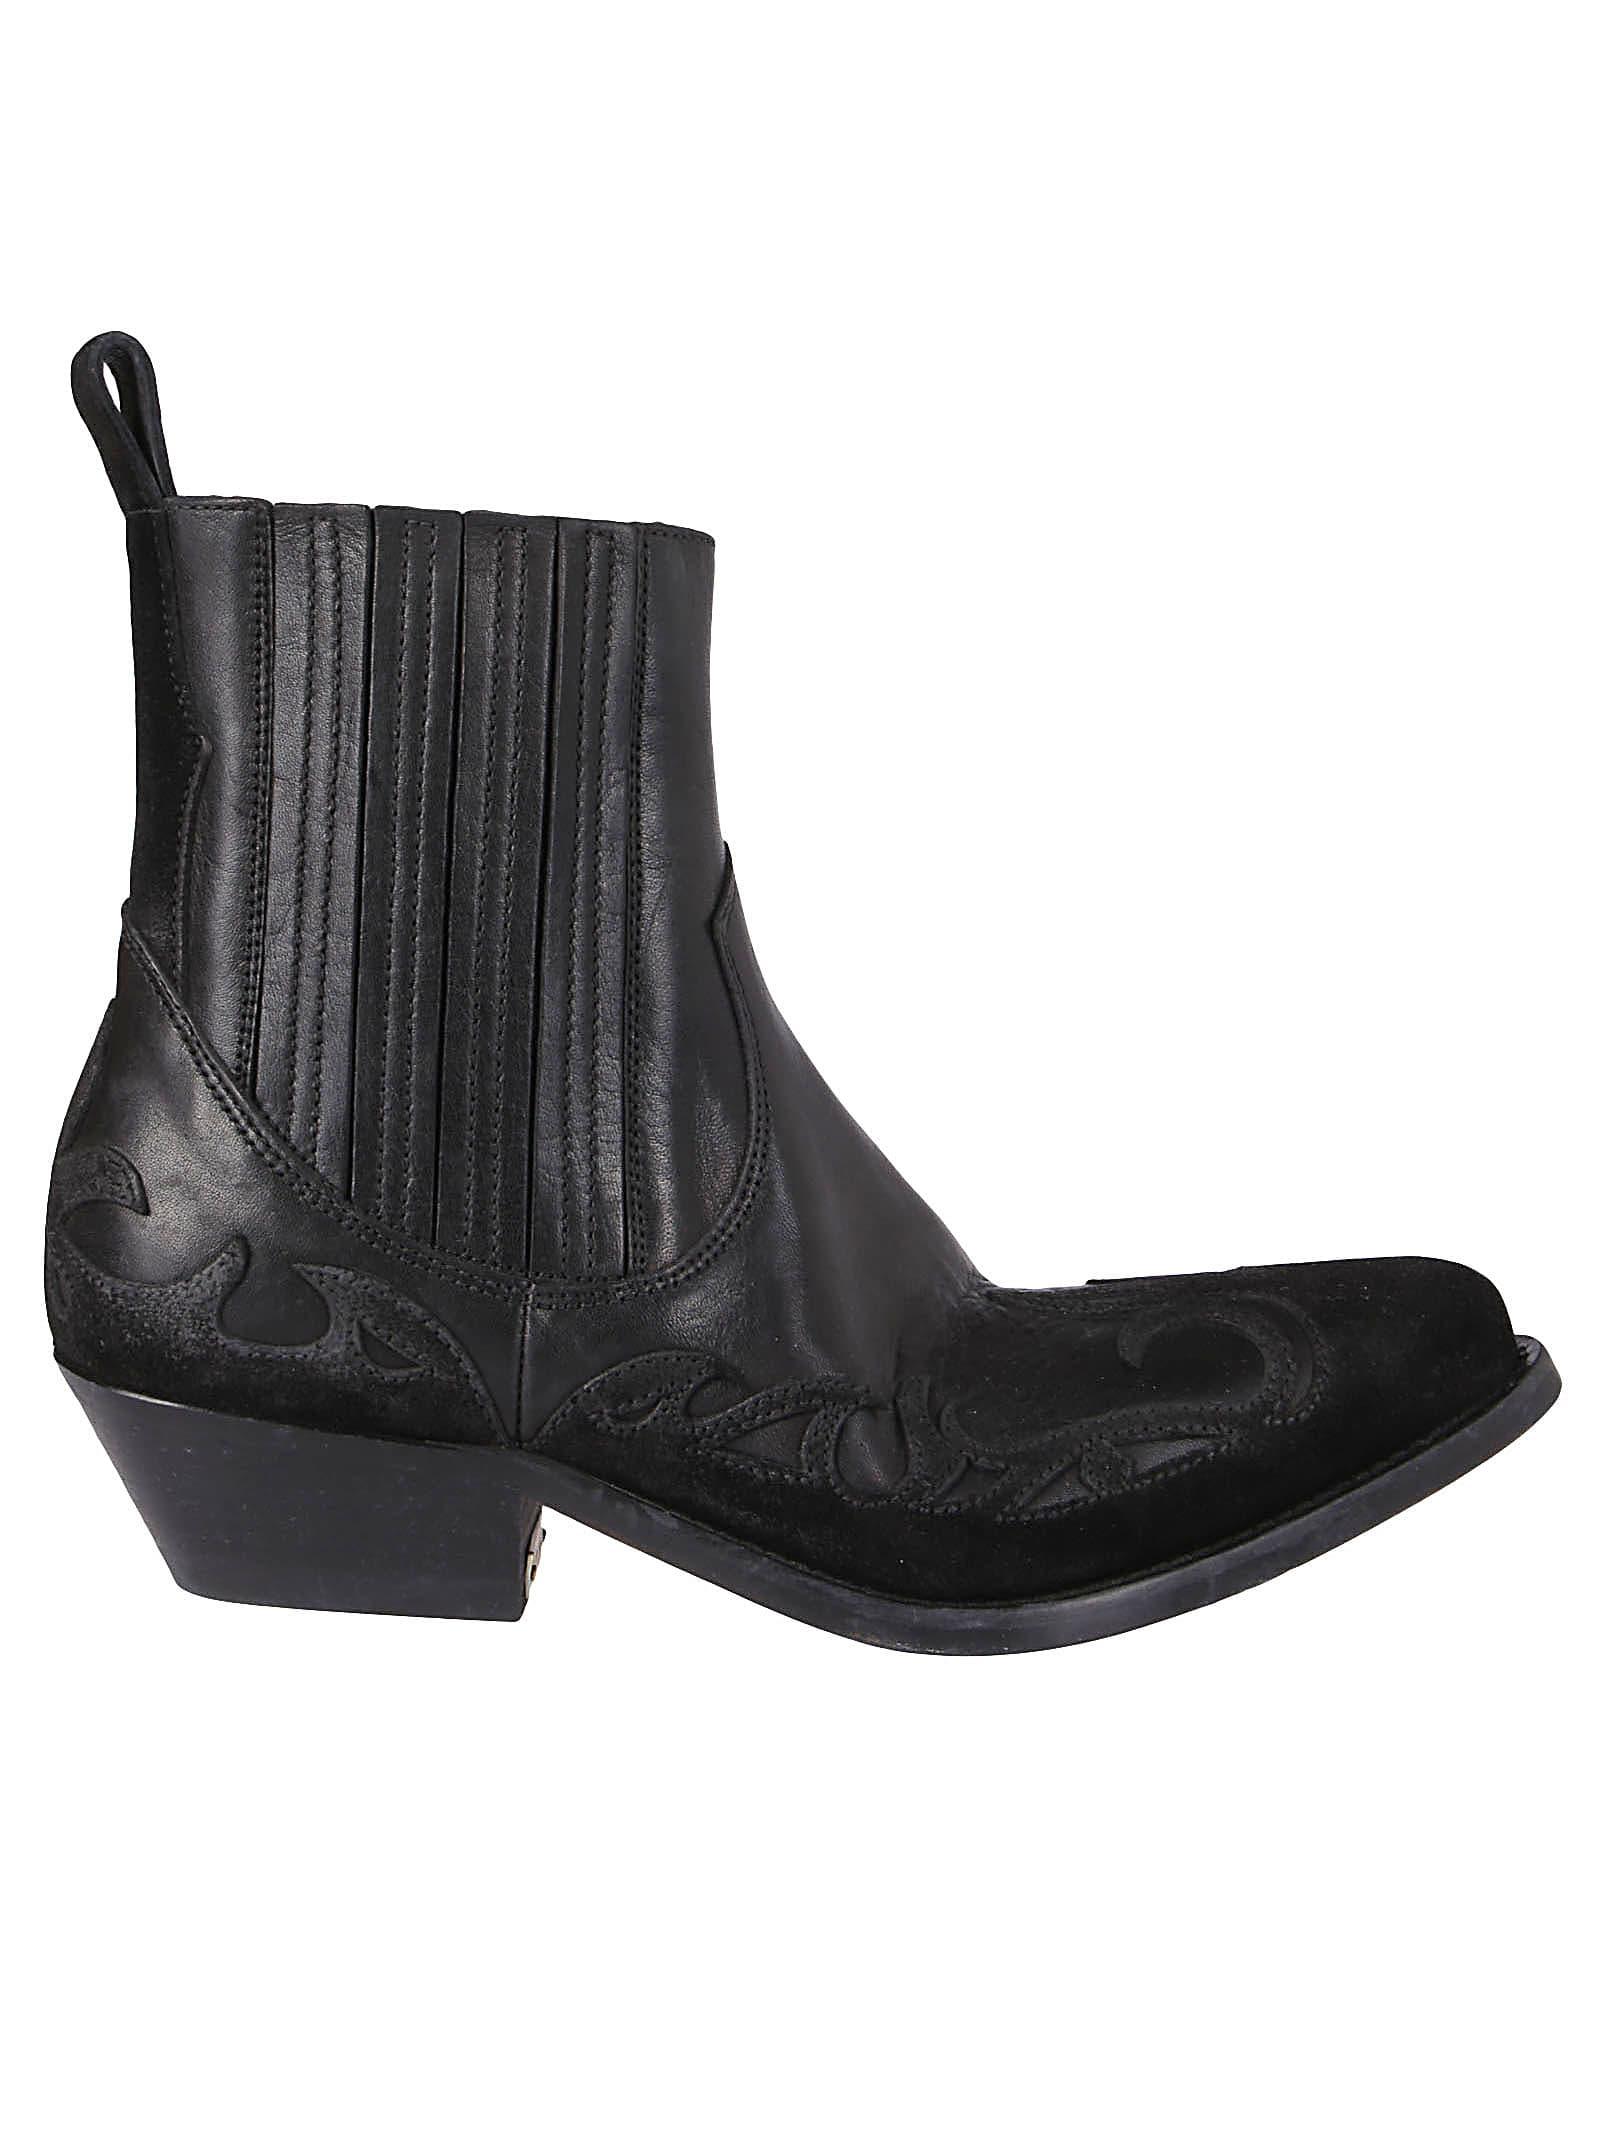 Golden Goose Black Leather Santiago Boots